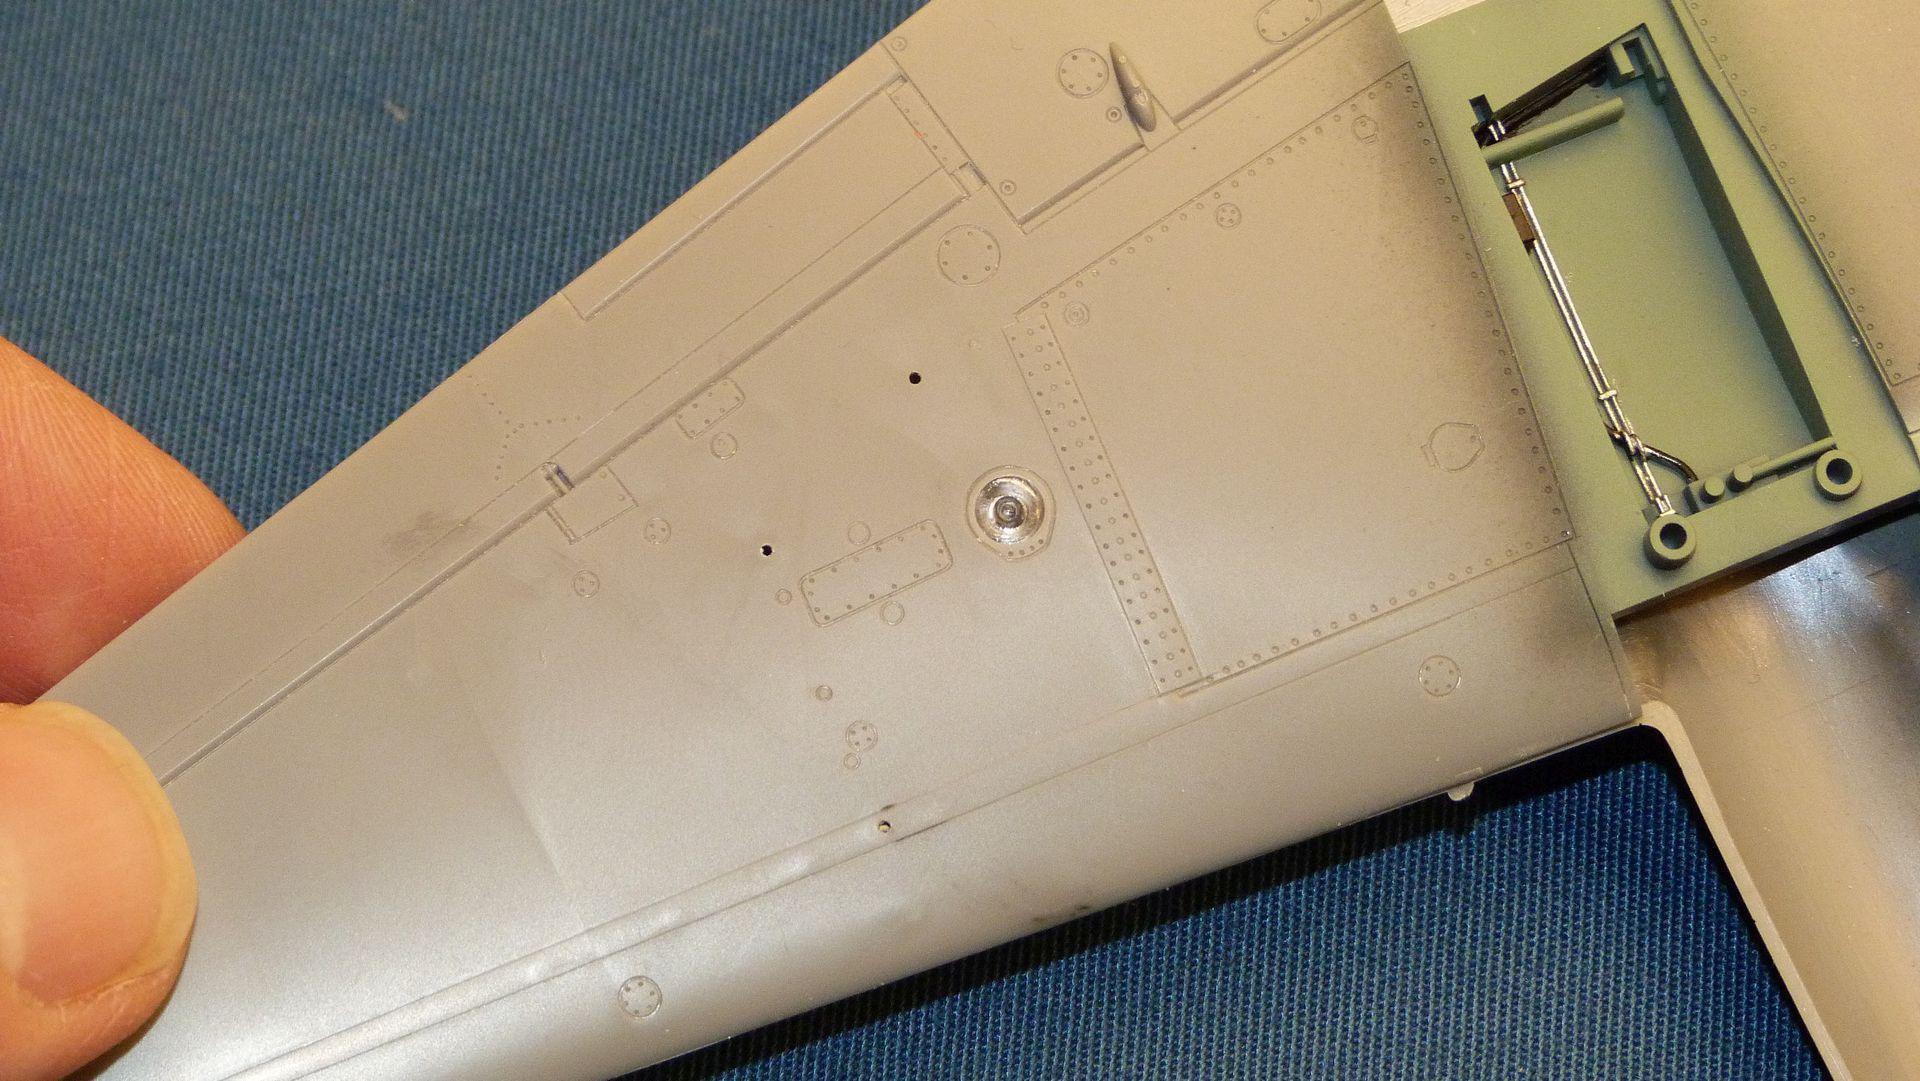 The Outriders, 333 Sqn (Nor) Coastal Command Mosquito FB. VI - Sida 2 46844464262_48f42e6a90_o